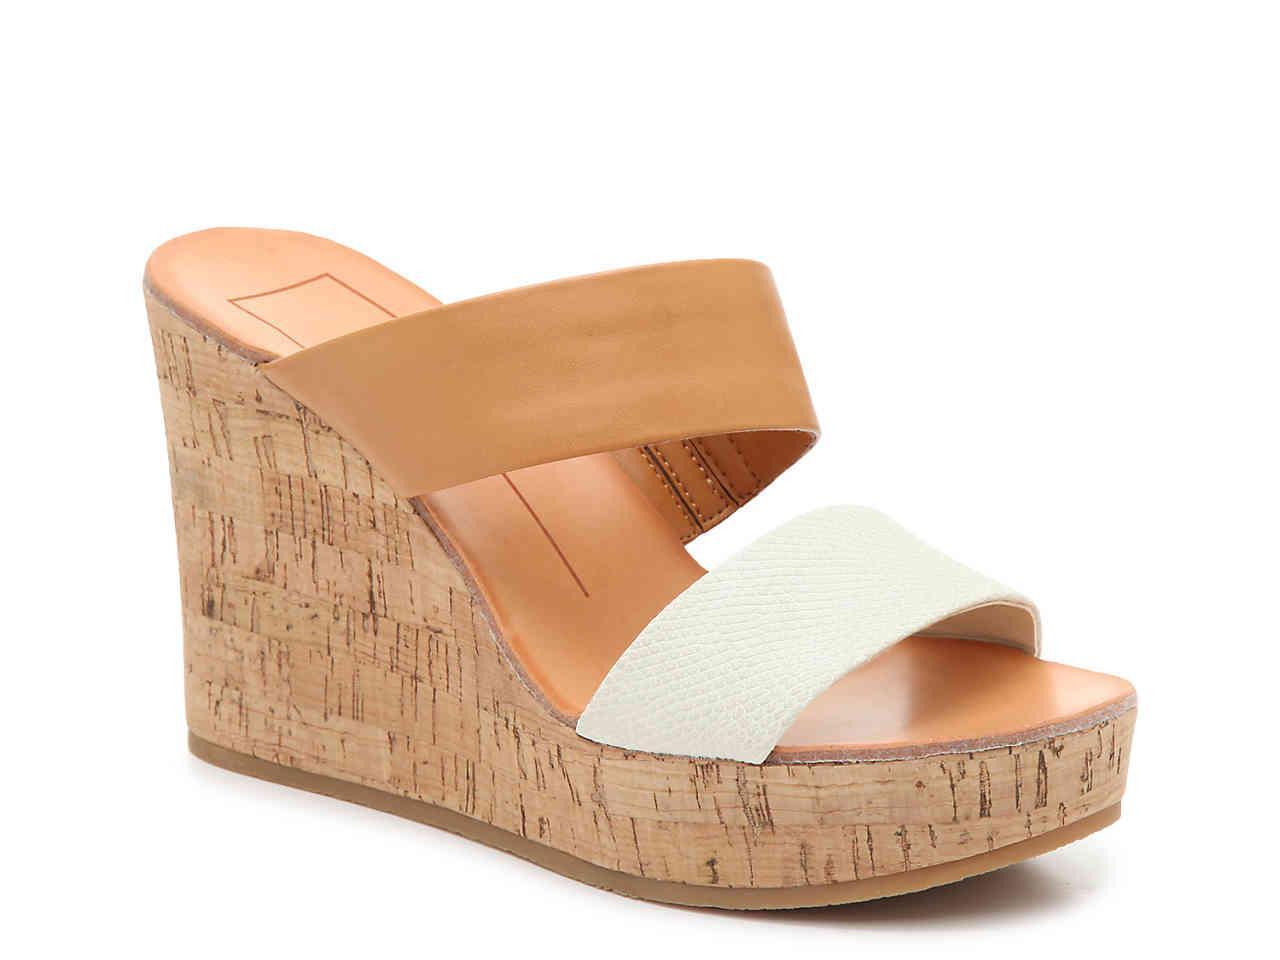 82860802d7a7 Dolce Vita. Women s Porcia Wedge Sandal